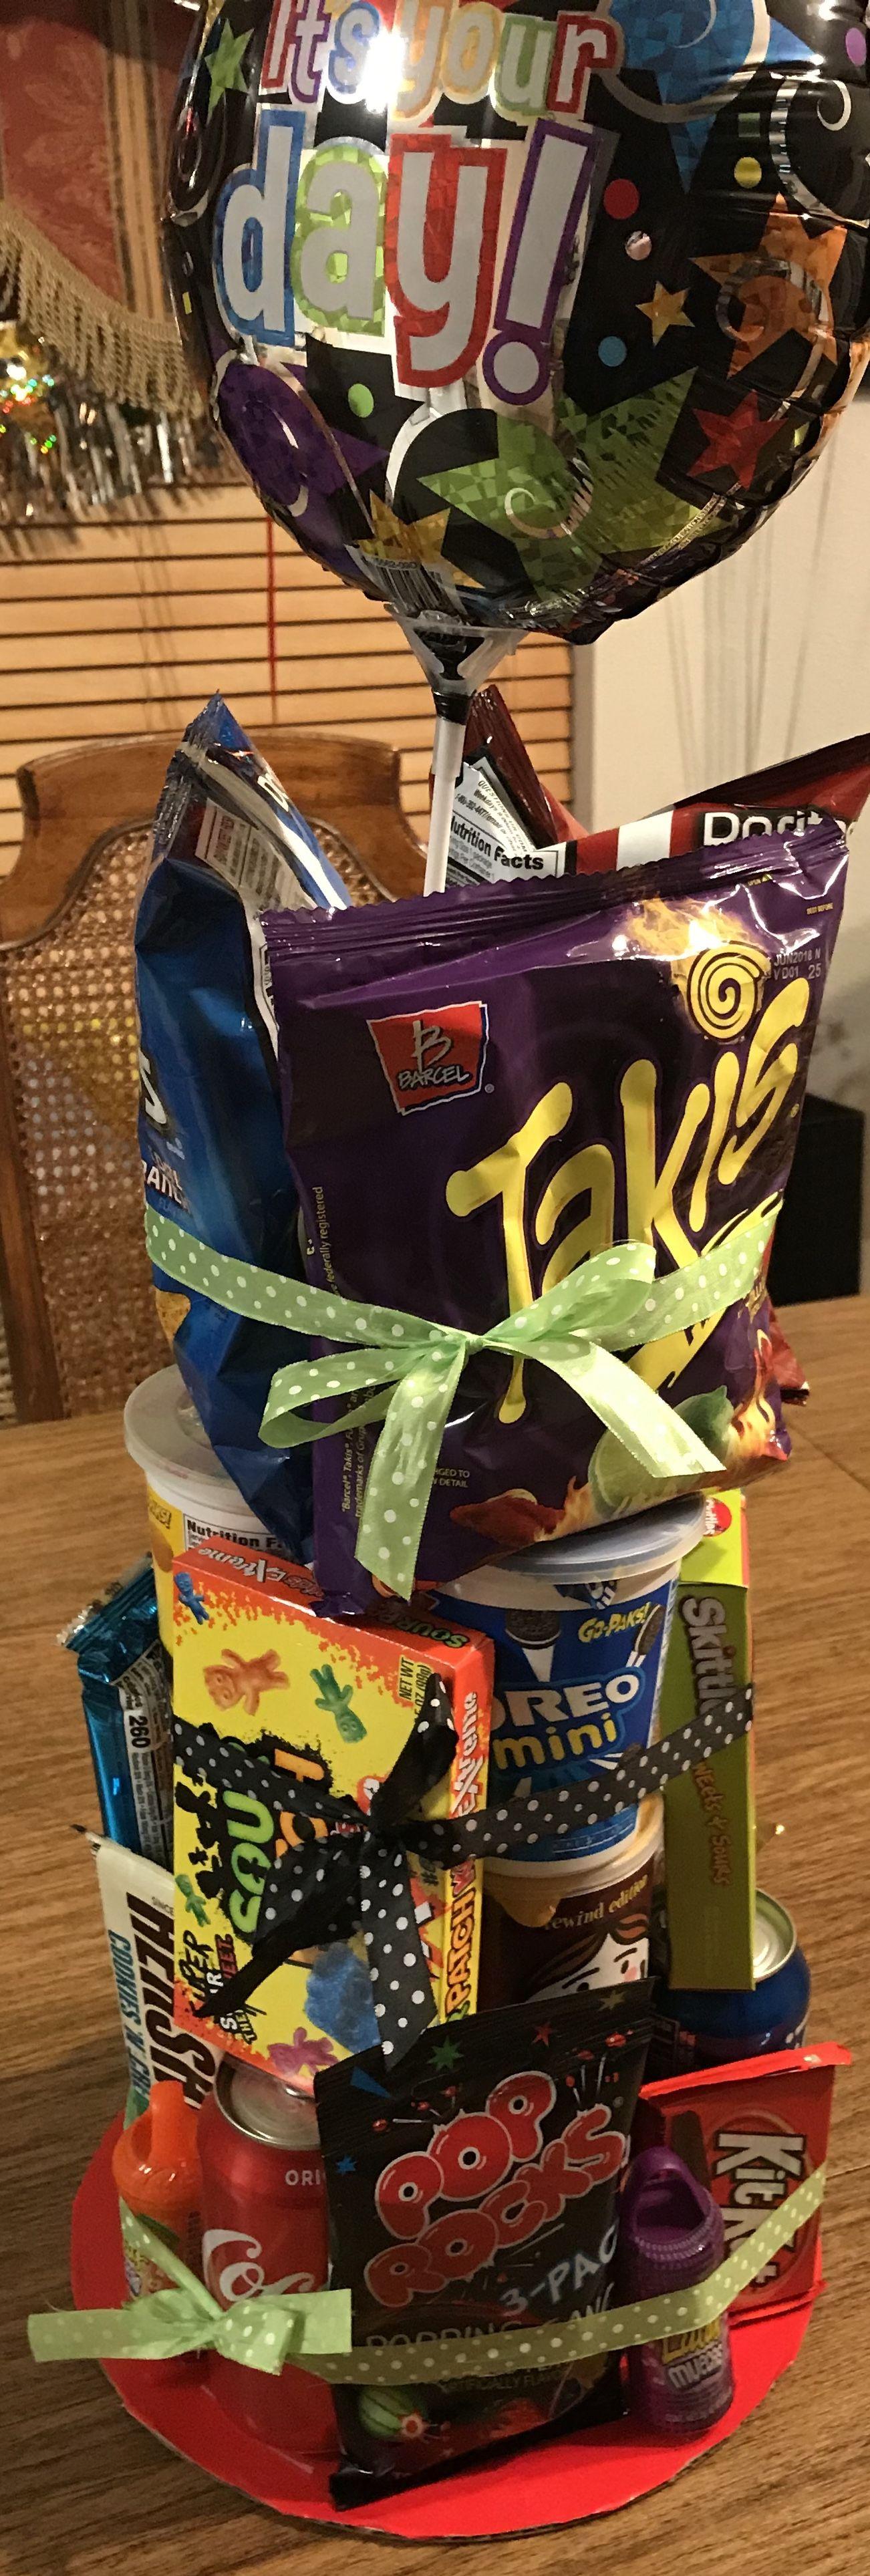 Birthday snack tower gift for 12year old boy birthday